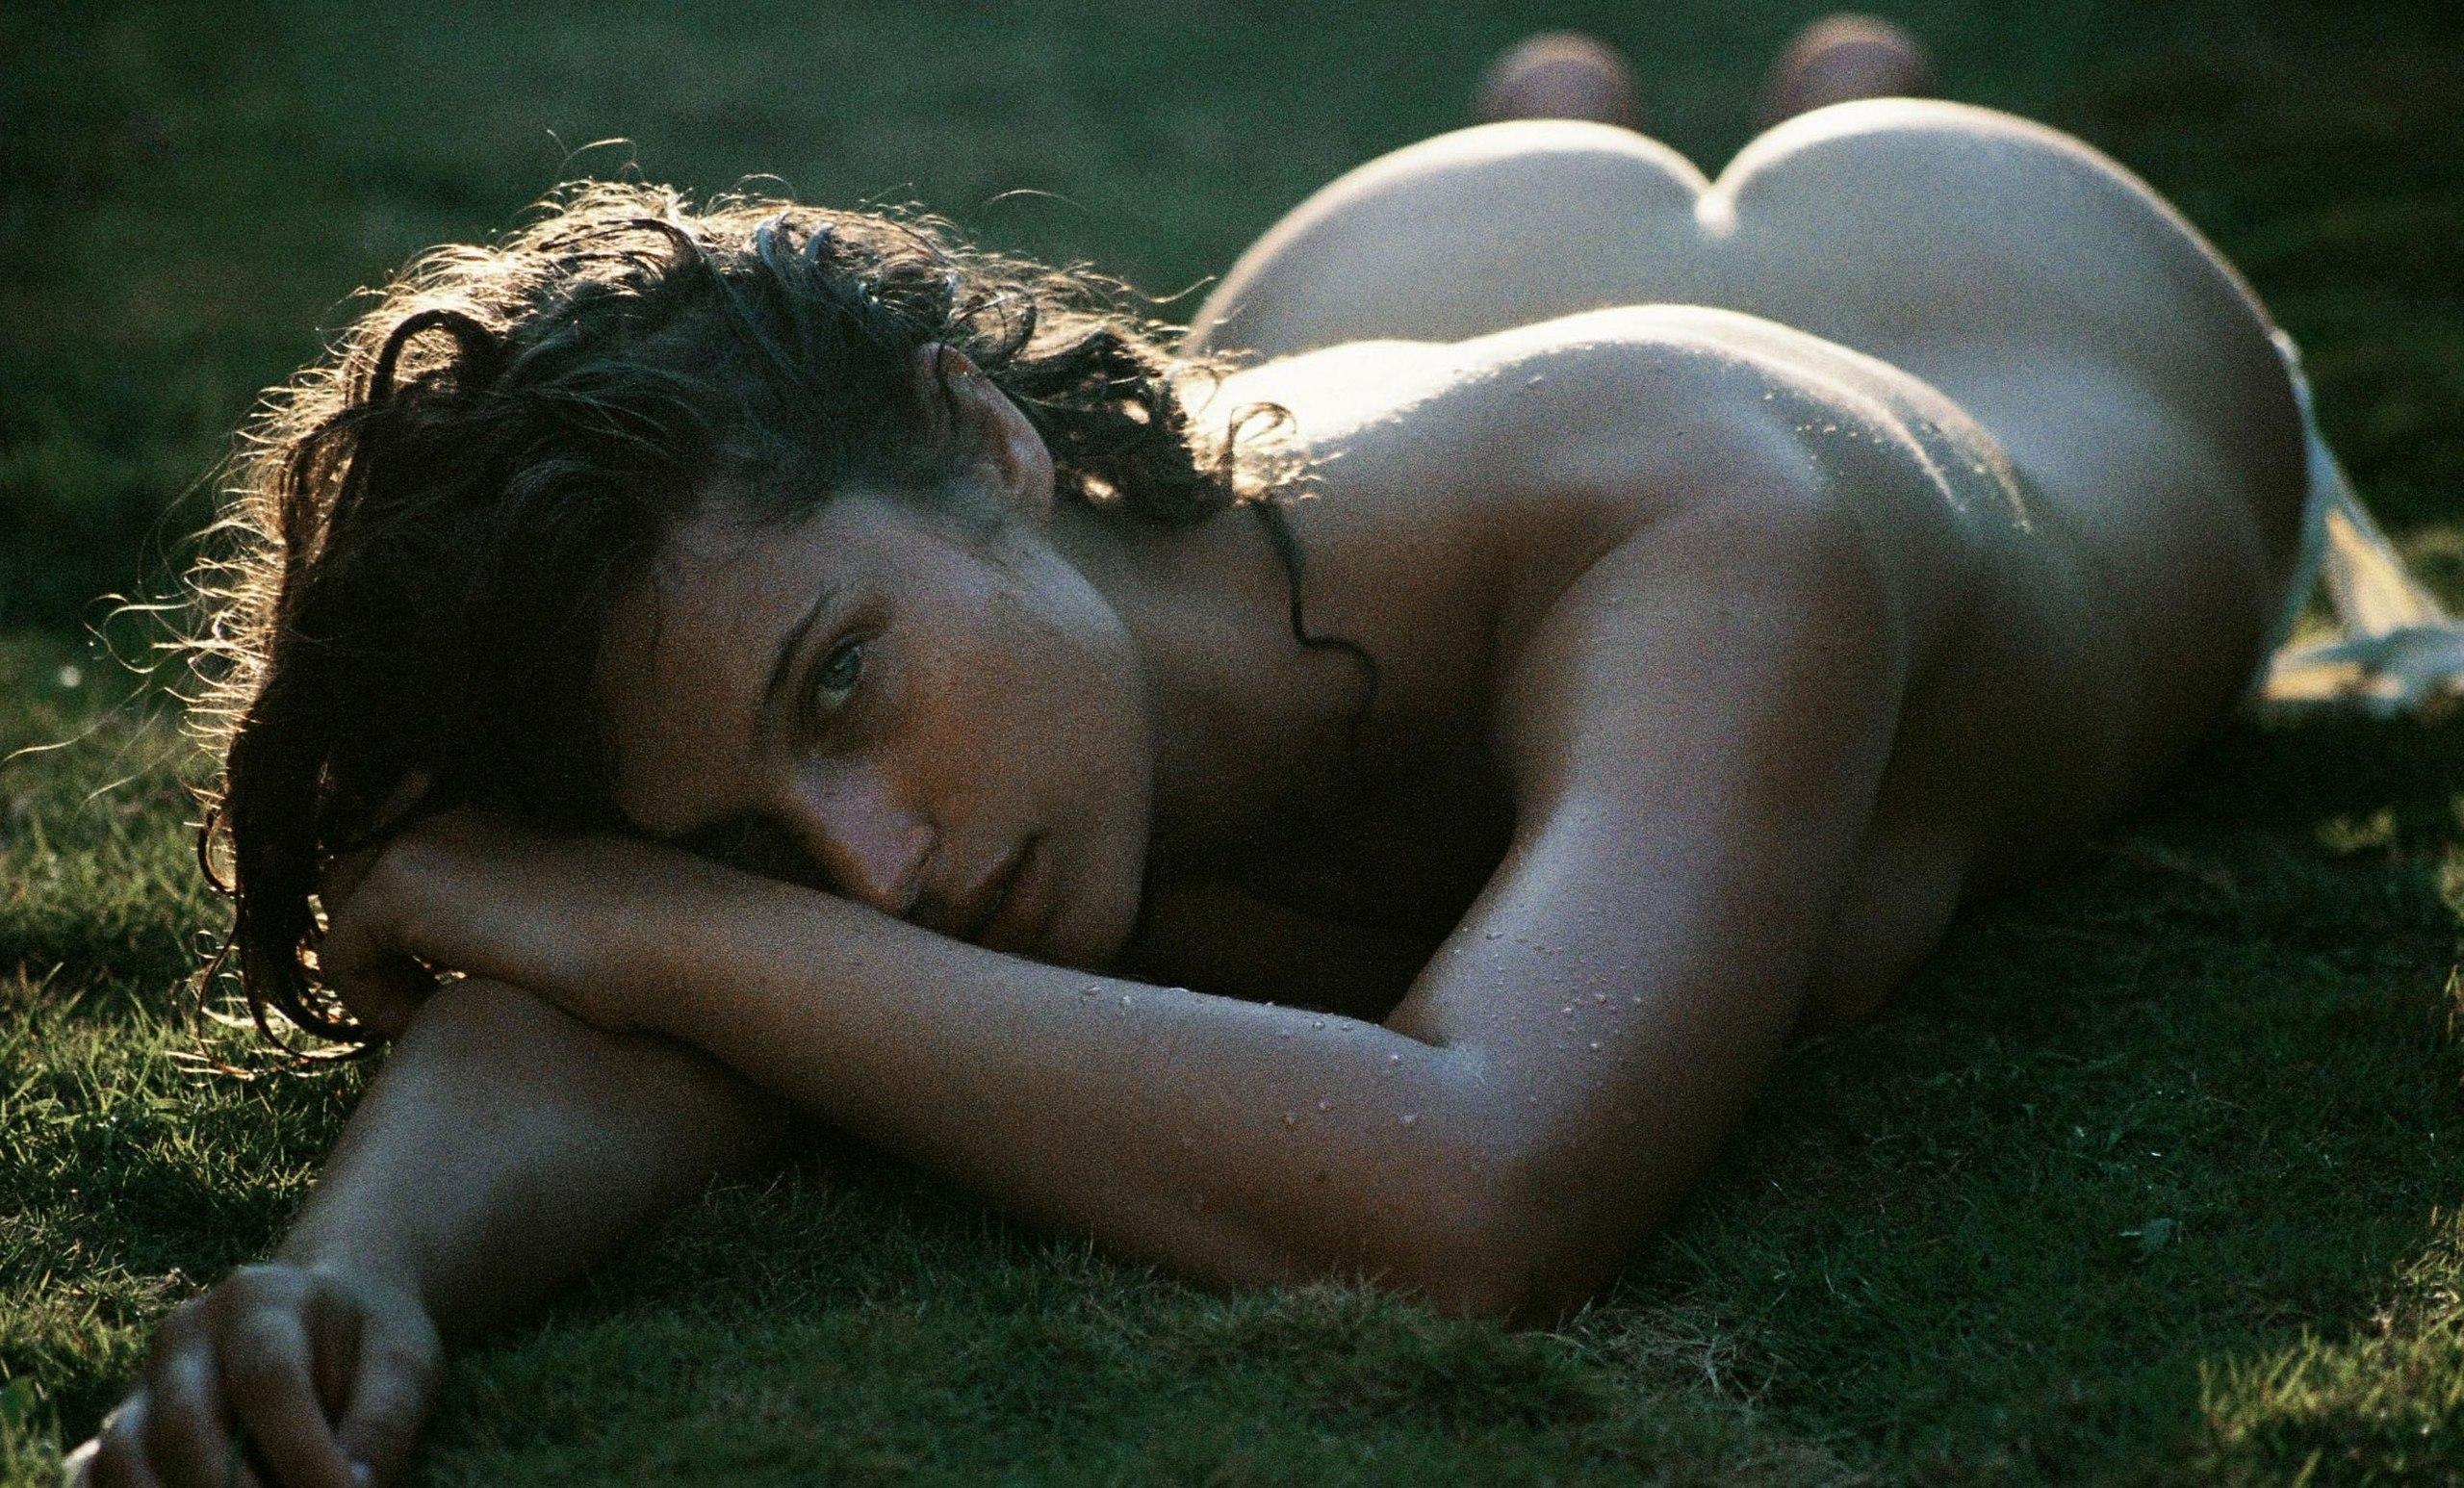 Topless Lise Olsen naked (48 foto and video), Topless, Bikini, Feet, legs 2006